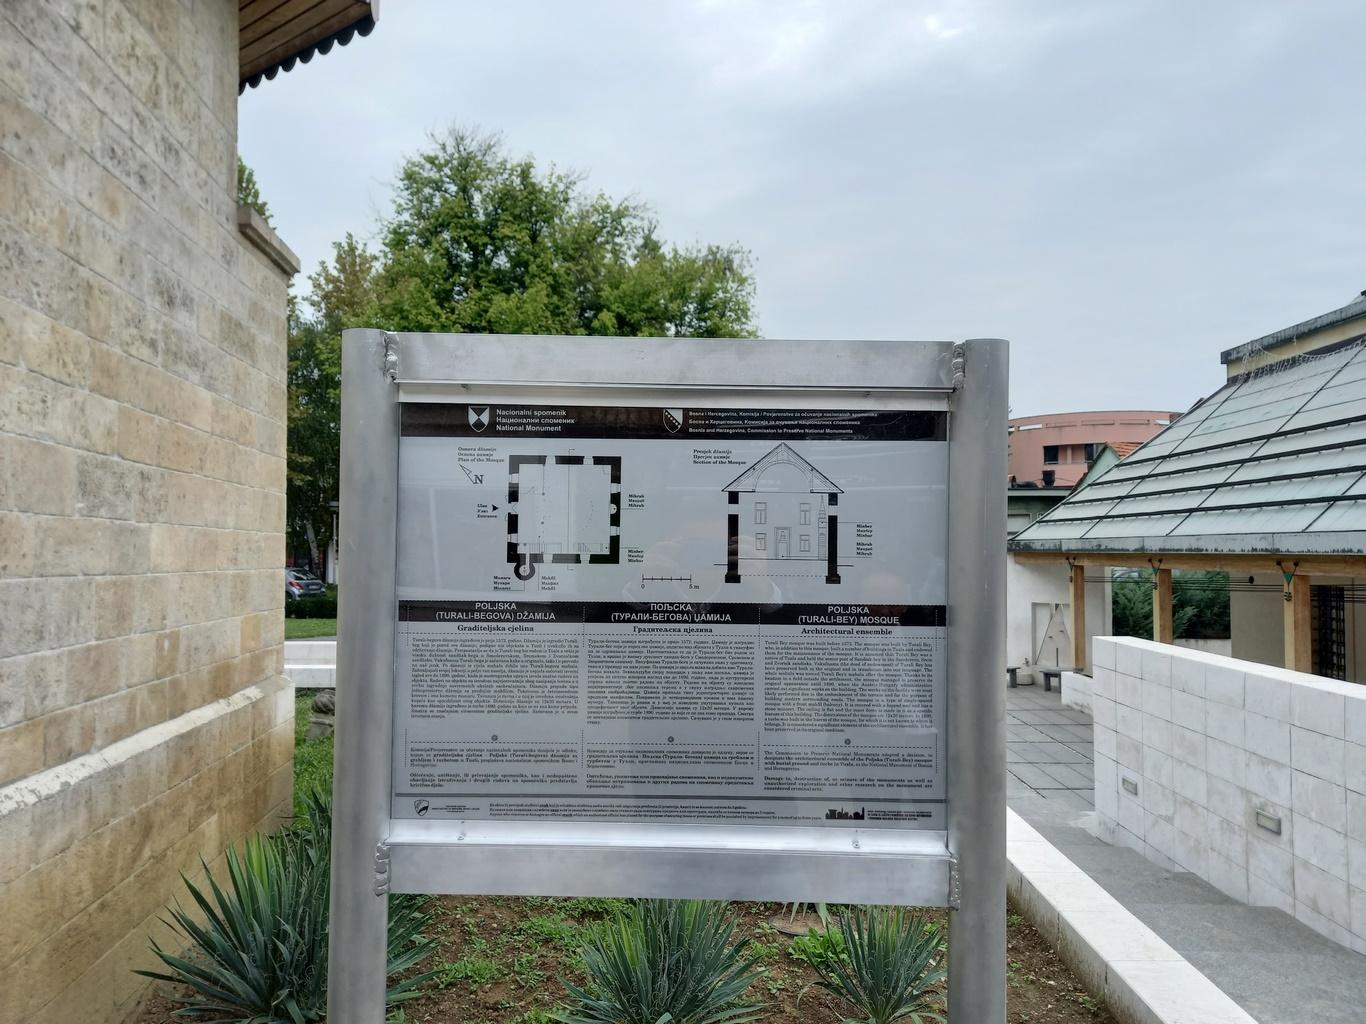 Postavljanje informacionih tabli za nacionalne spomenike